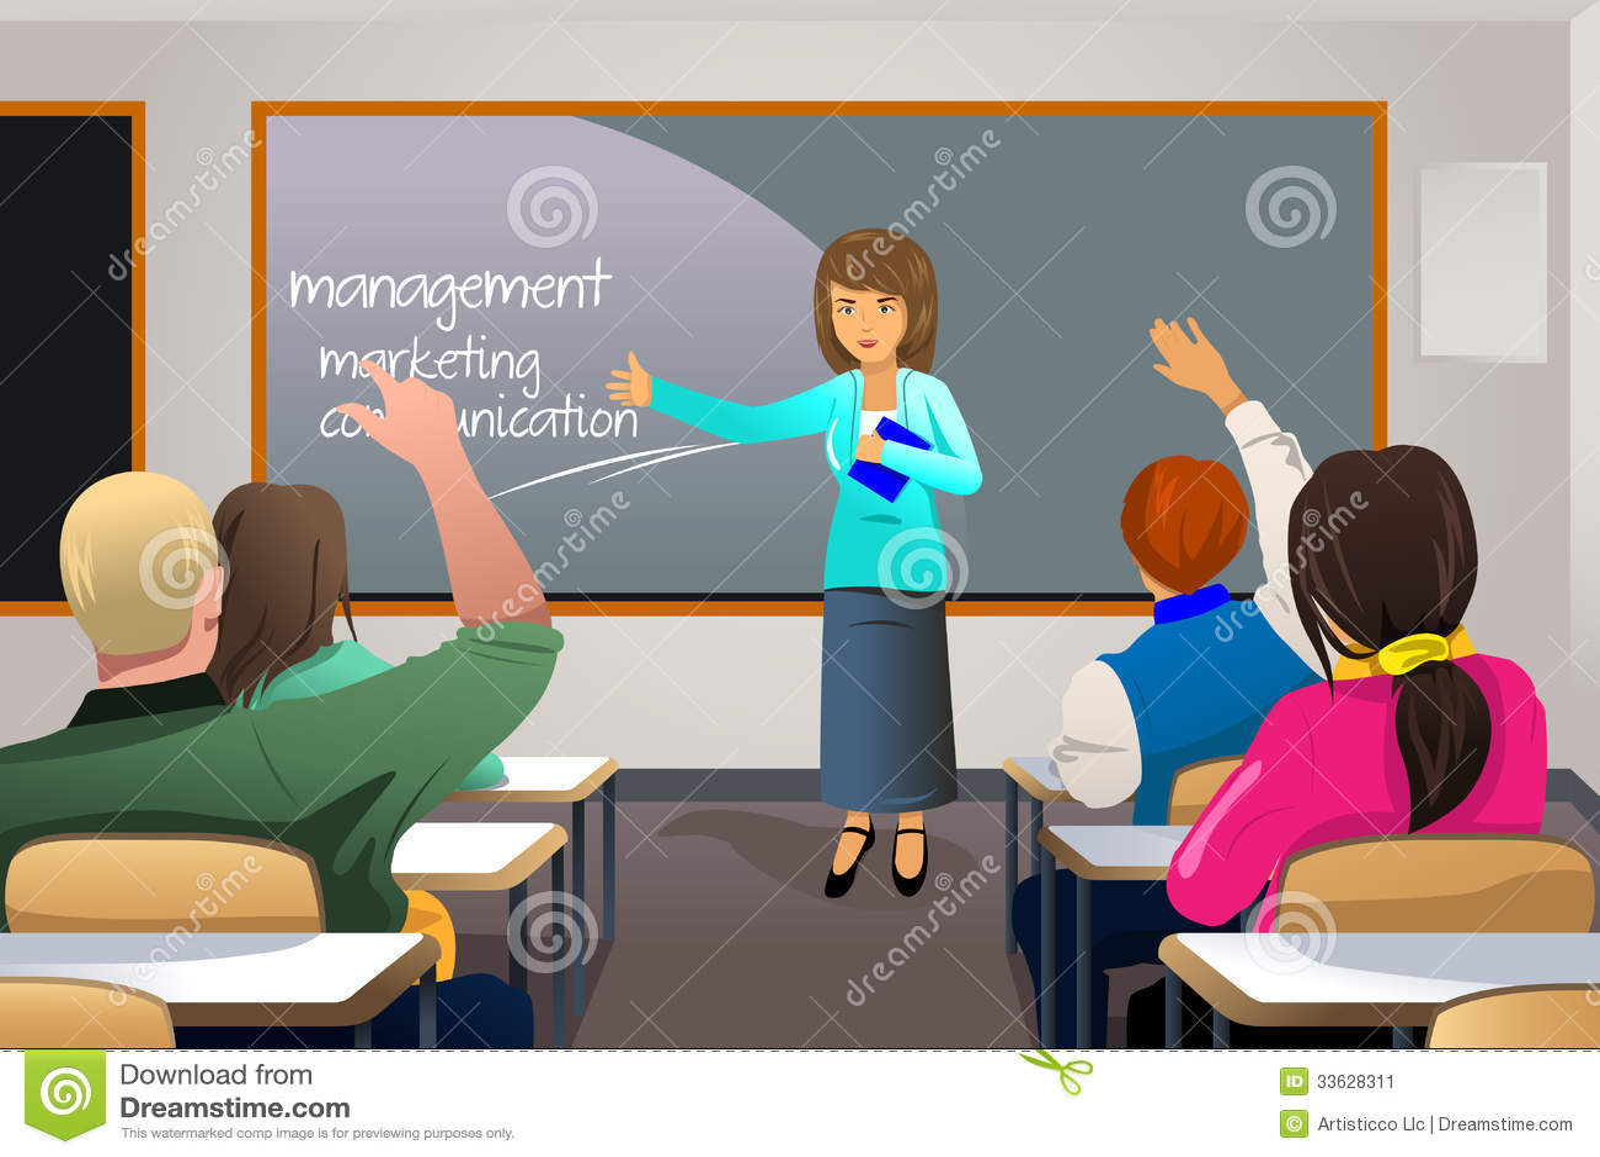 my personal desire as a teacher